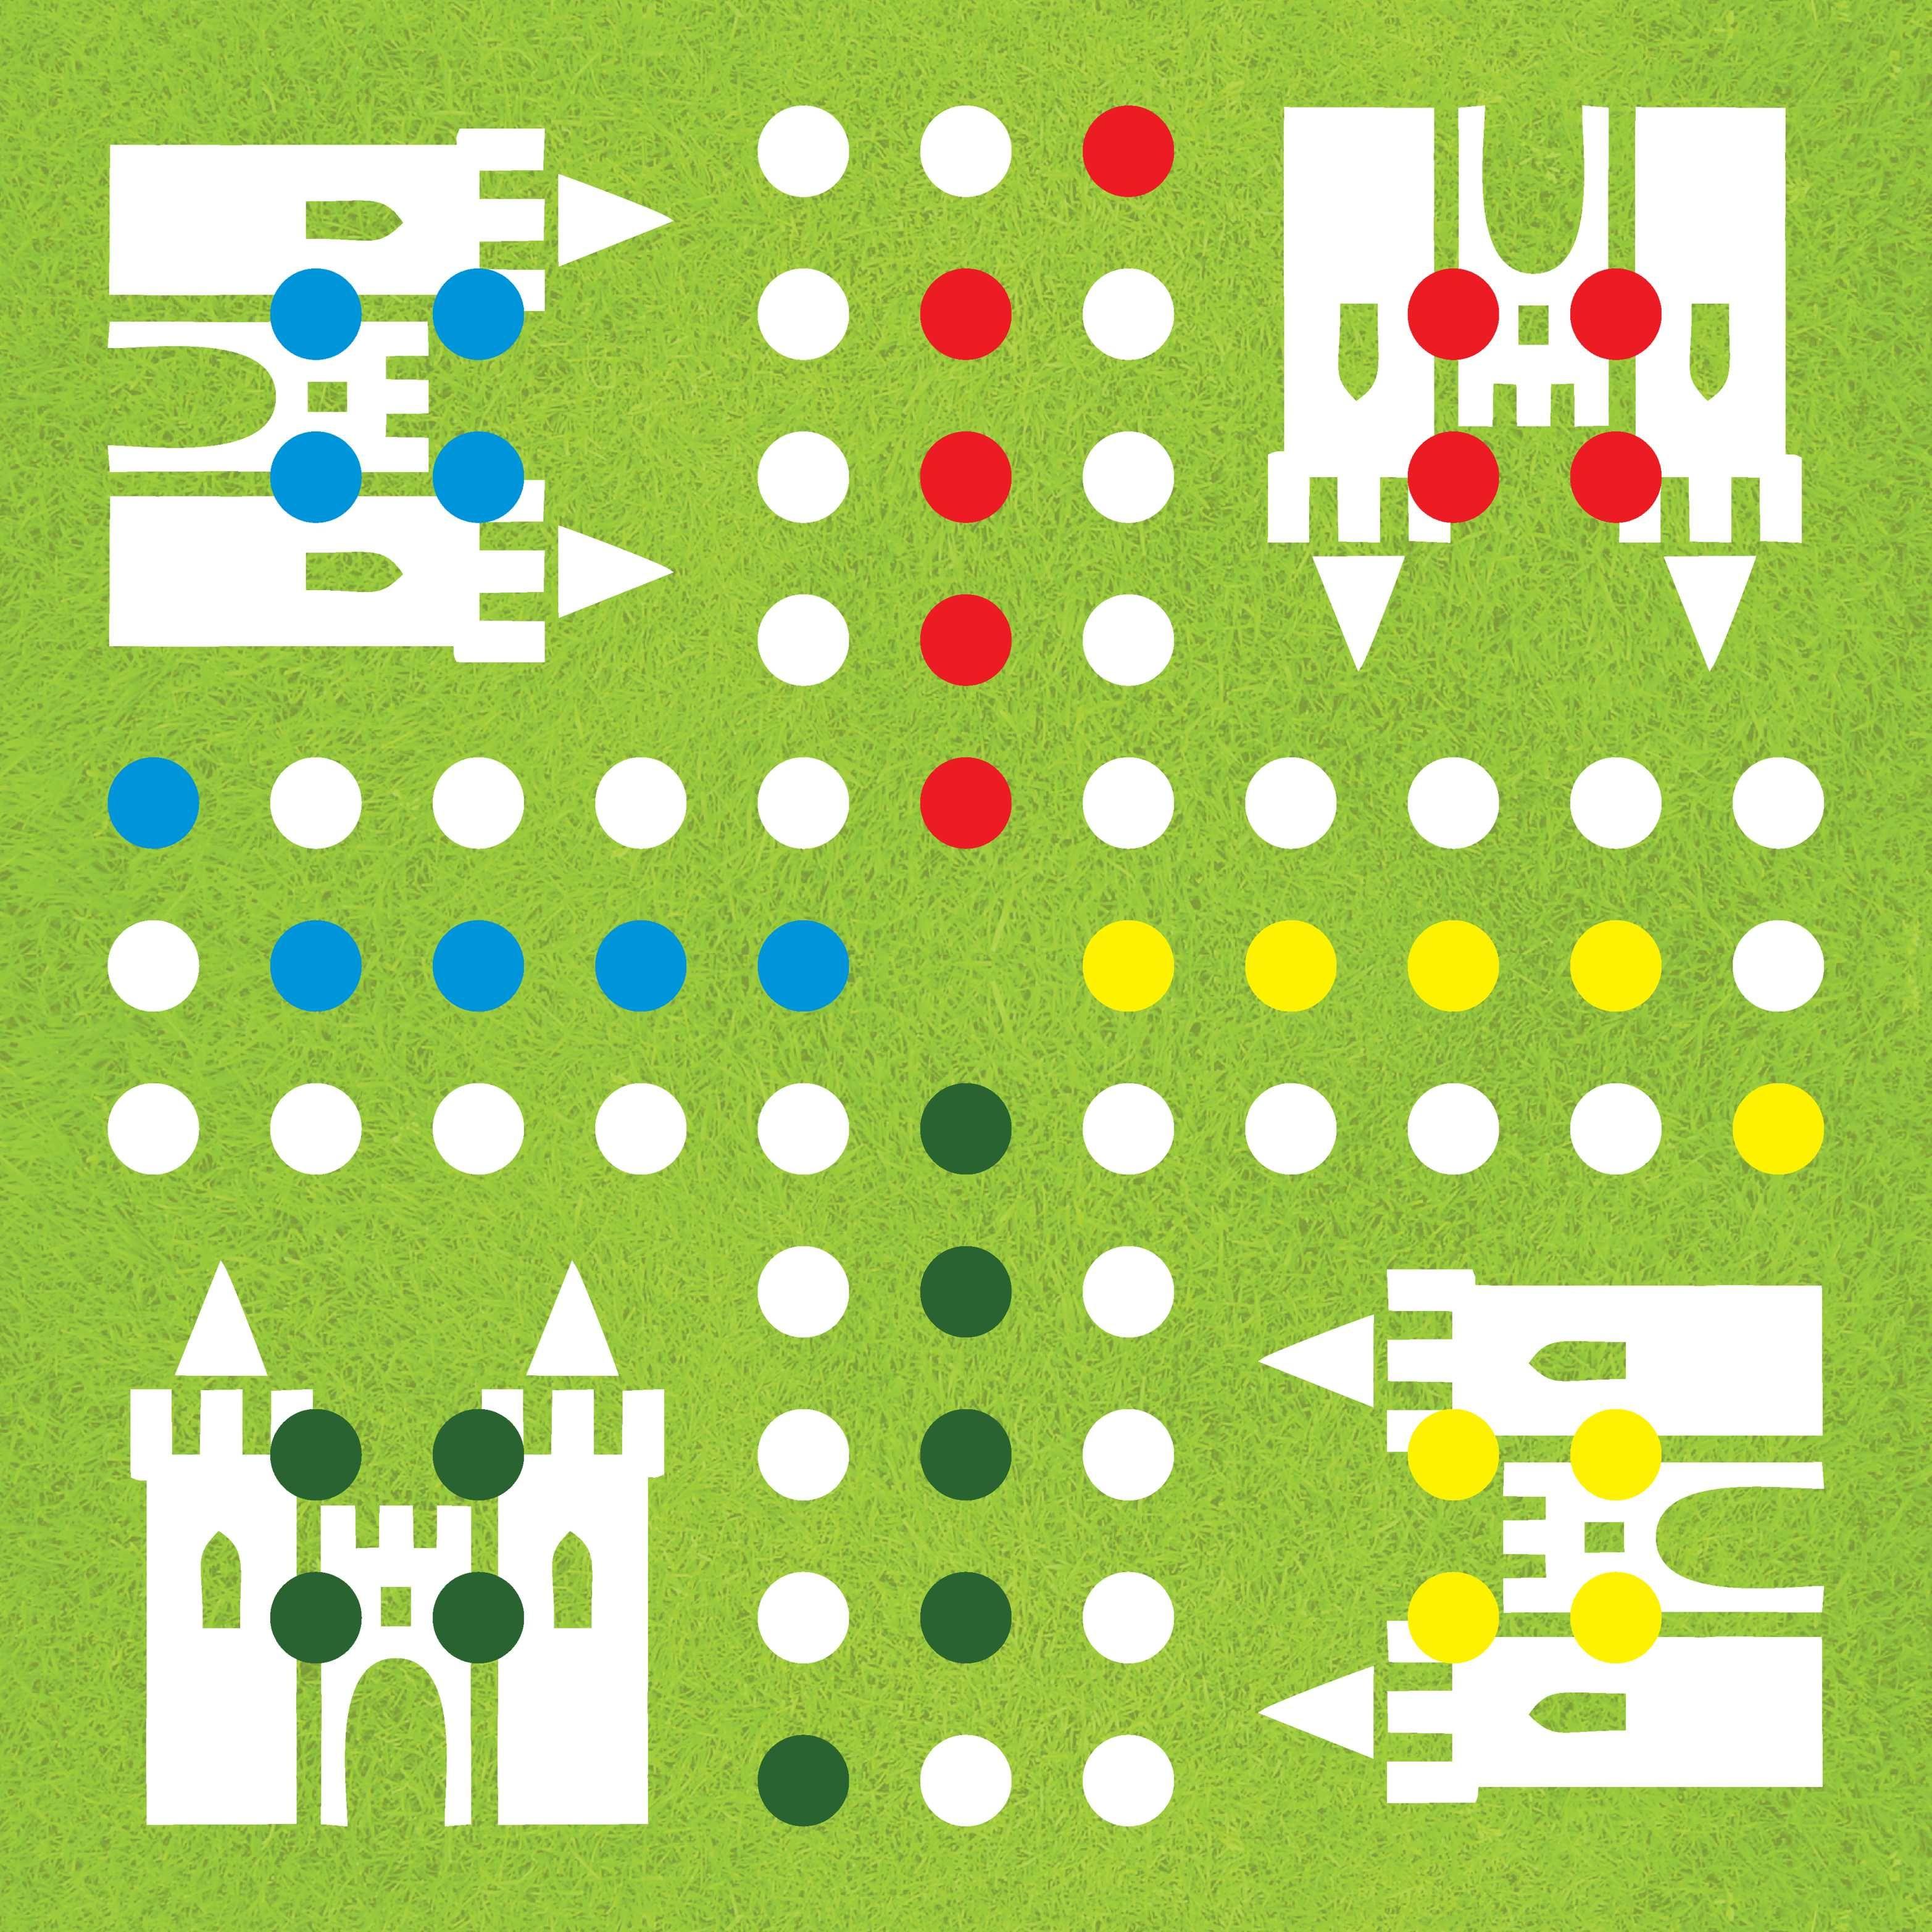 Diy-Ludo-Board-Game-Template - | Board Game | Pinterest | Board Game - Free Printable Ludo Board